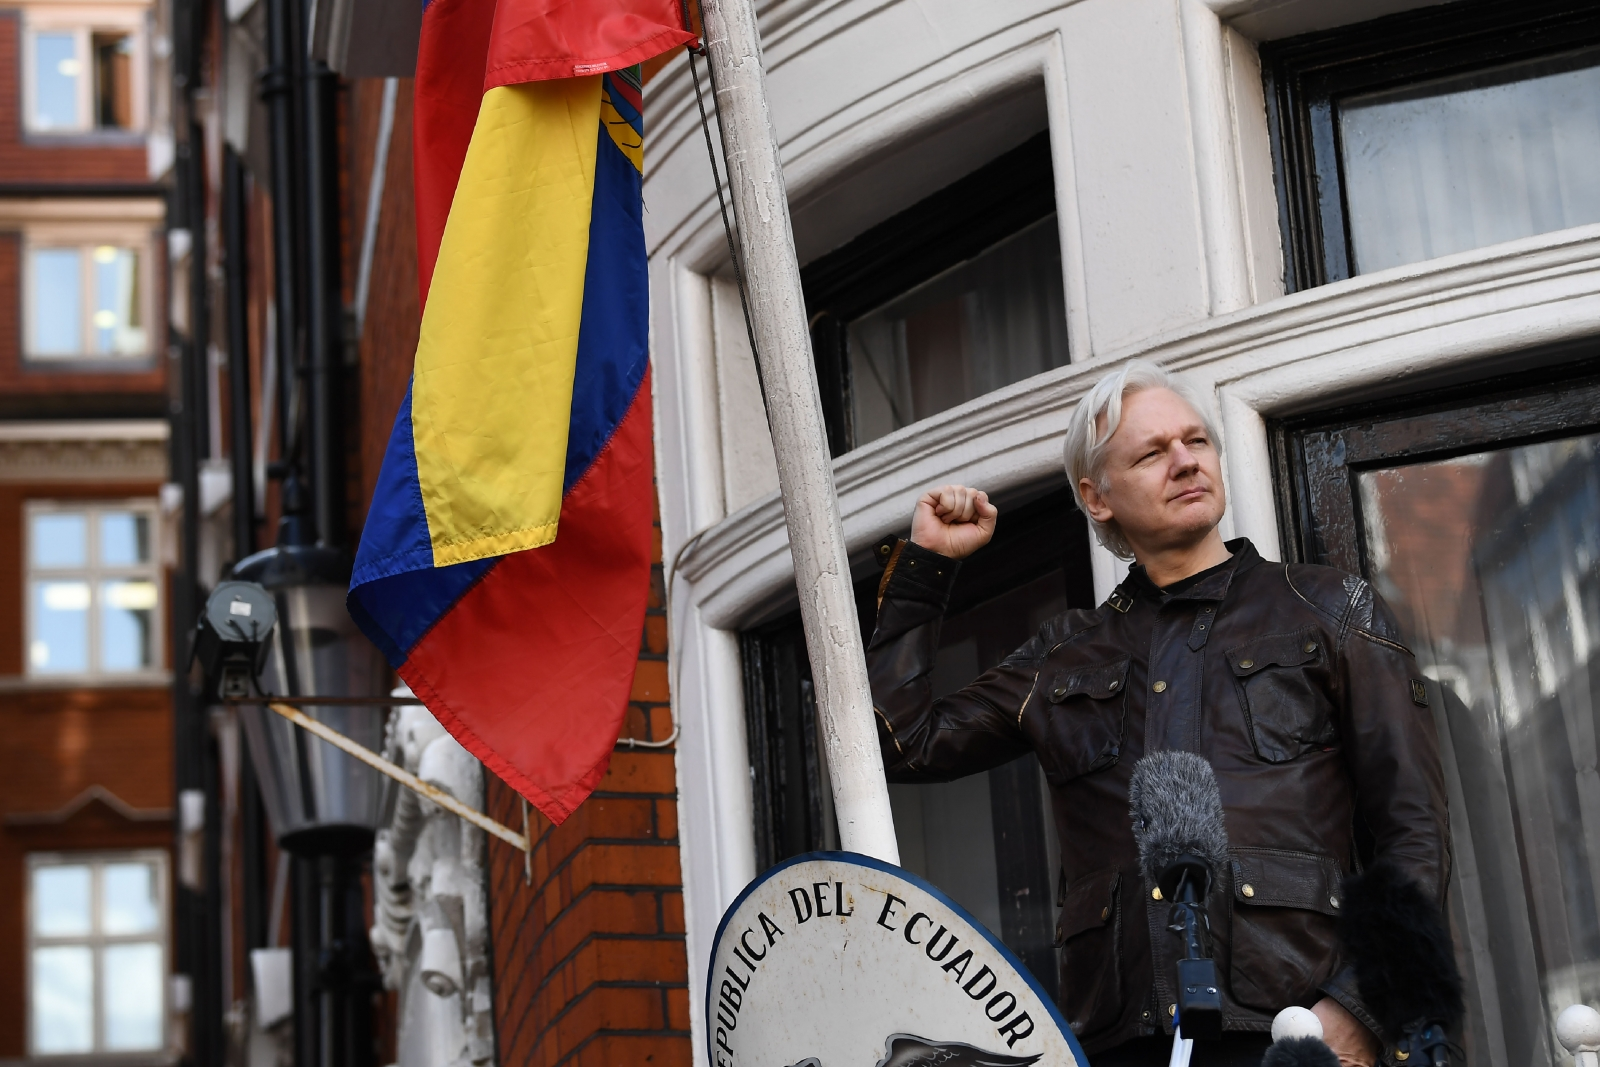 Ecuadorean president calls WikiLeaks founder a hacker